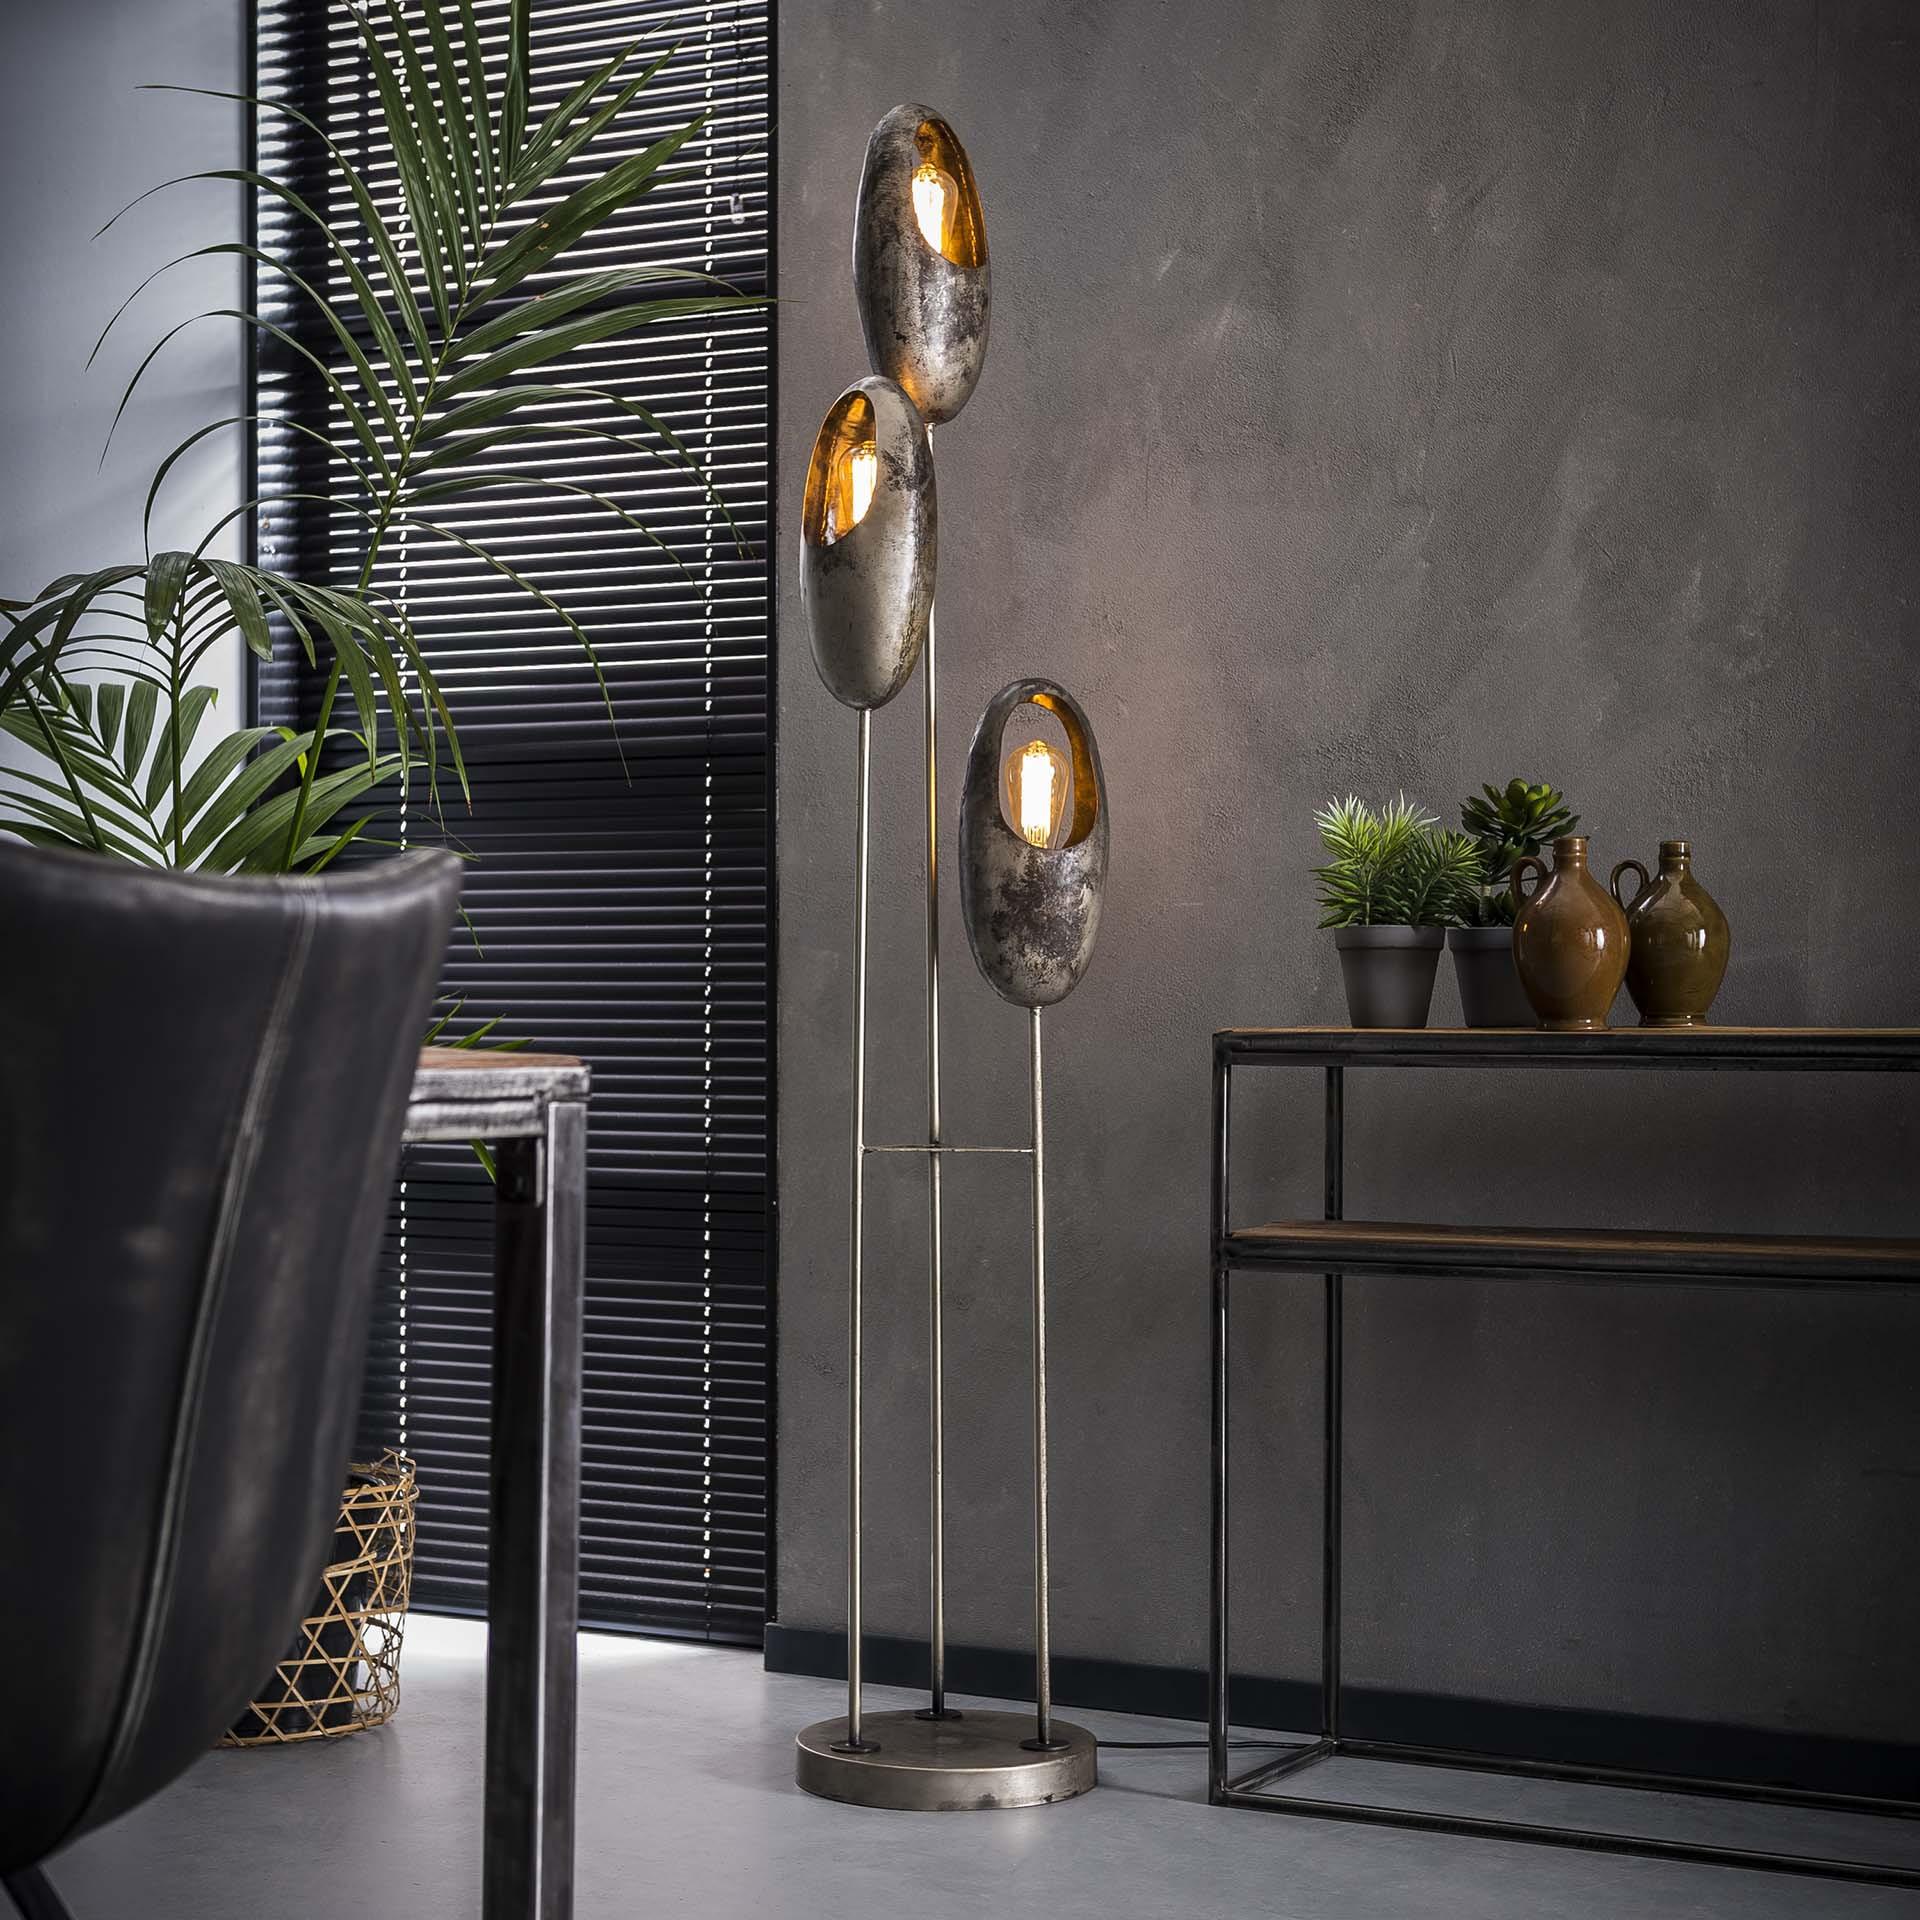 Vloerlamp 'Julianna', Metaal, 3-lamp, 170cm, kleur Oud Zilver